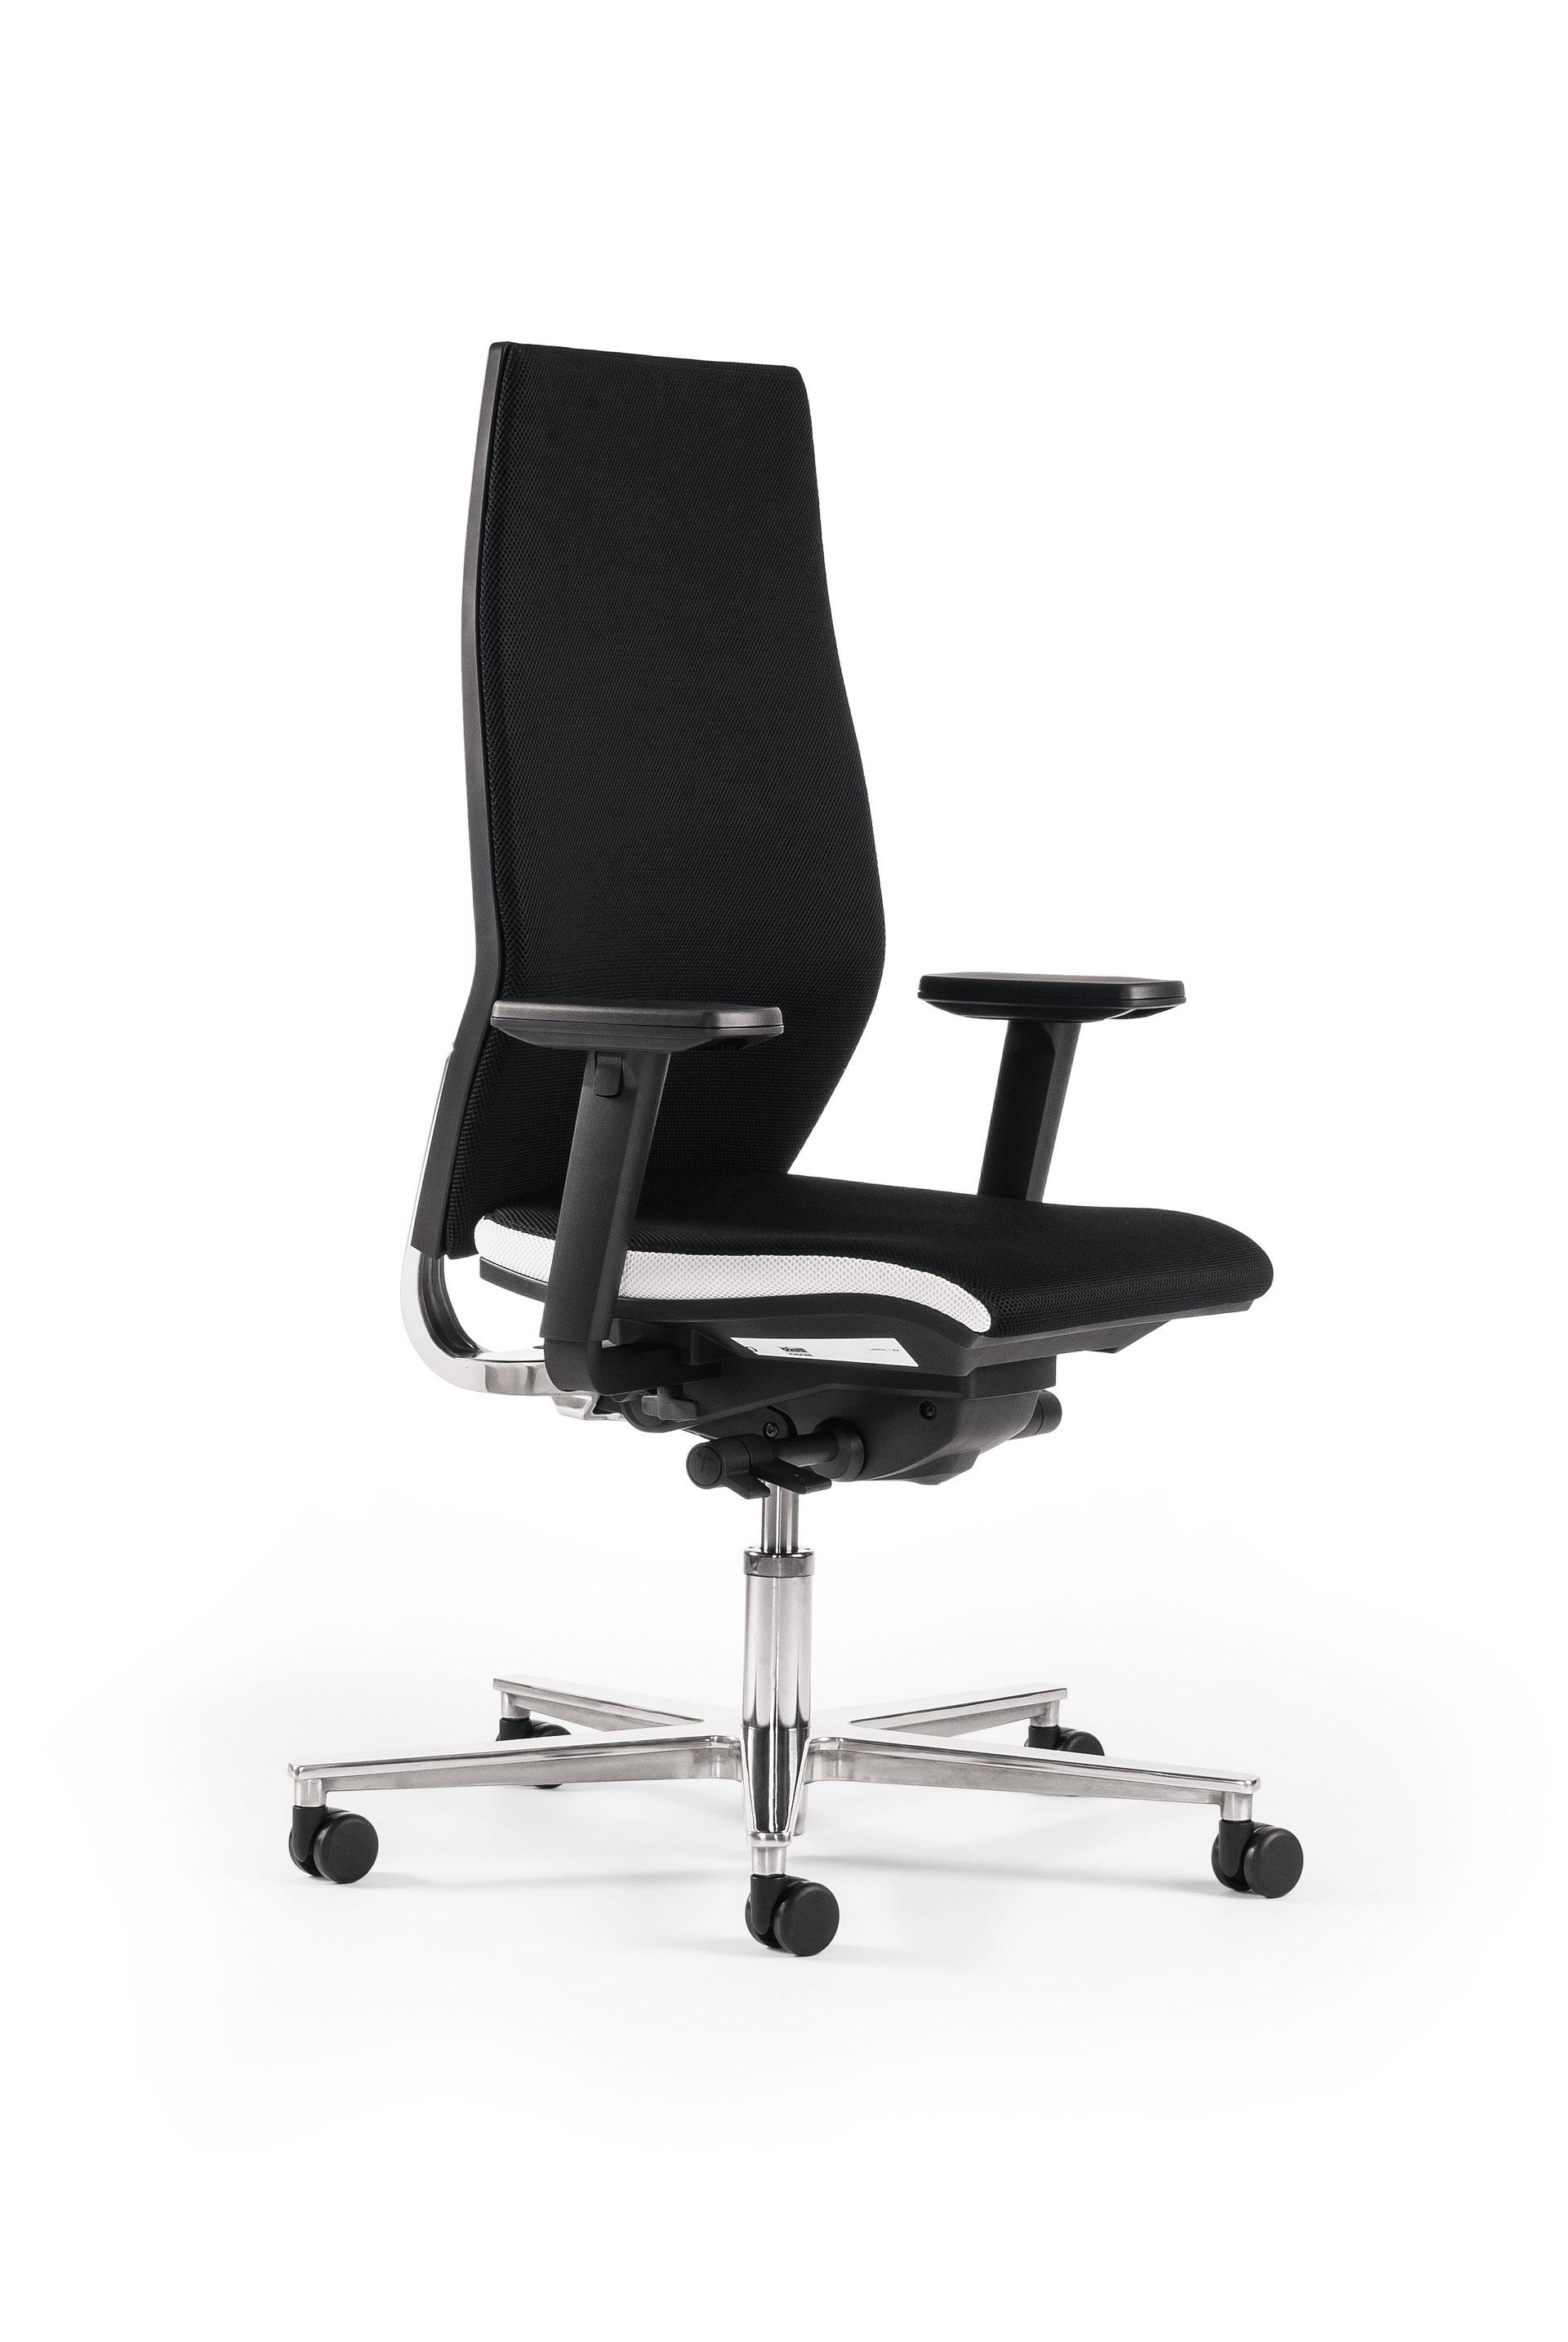 Rovo R12 Arbeitsplatzleuchte Arbeitsstuhl